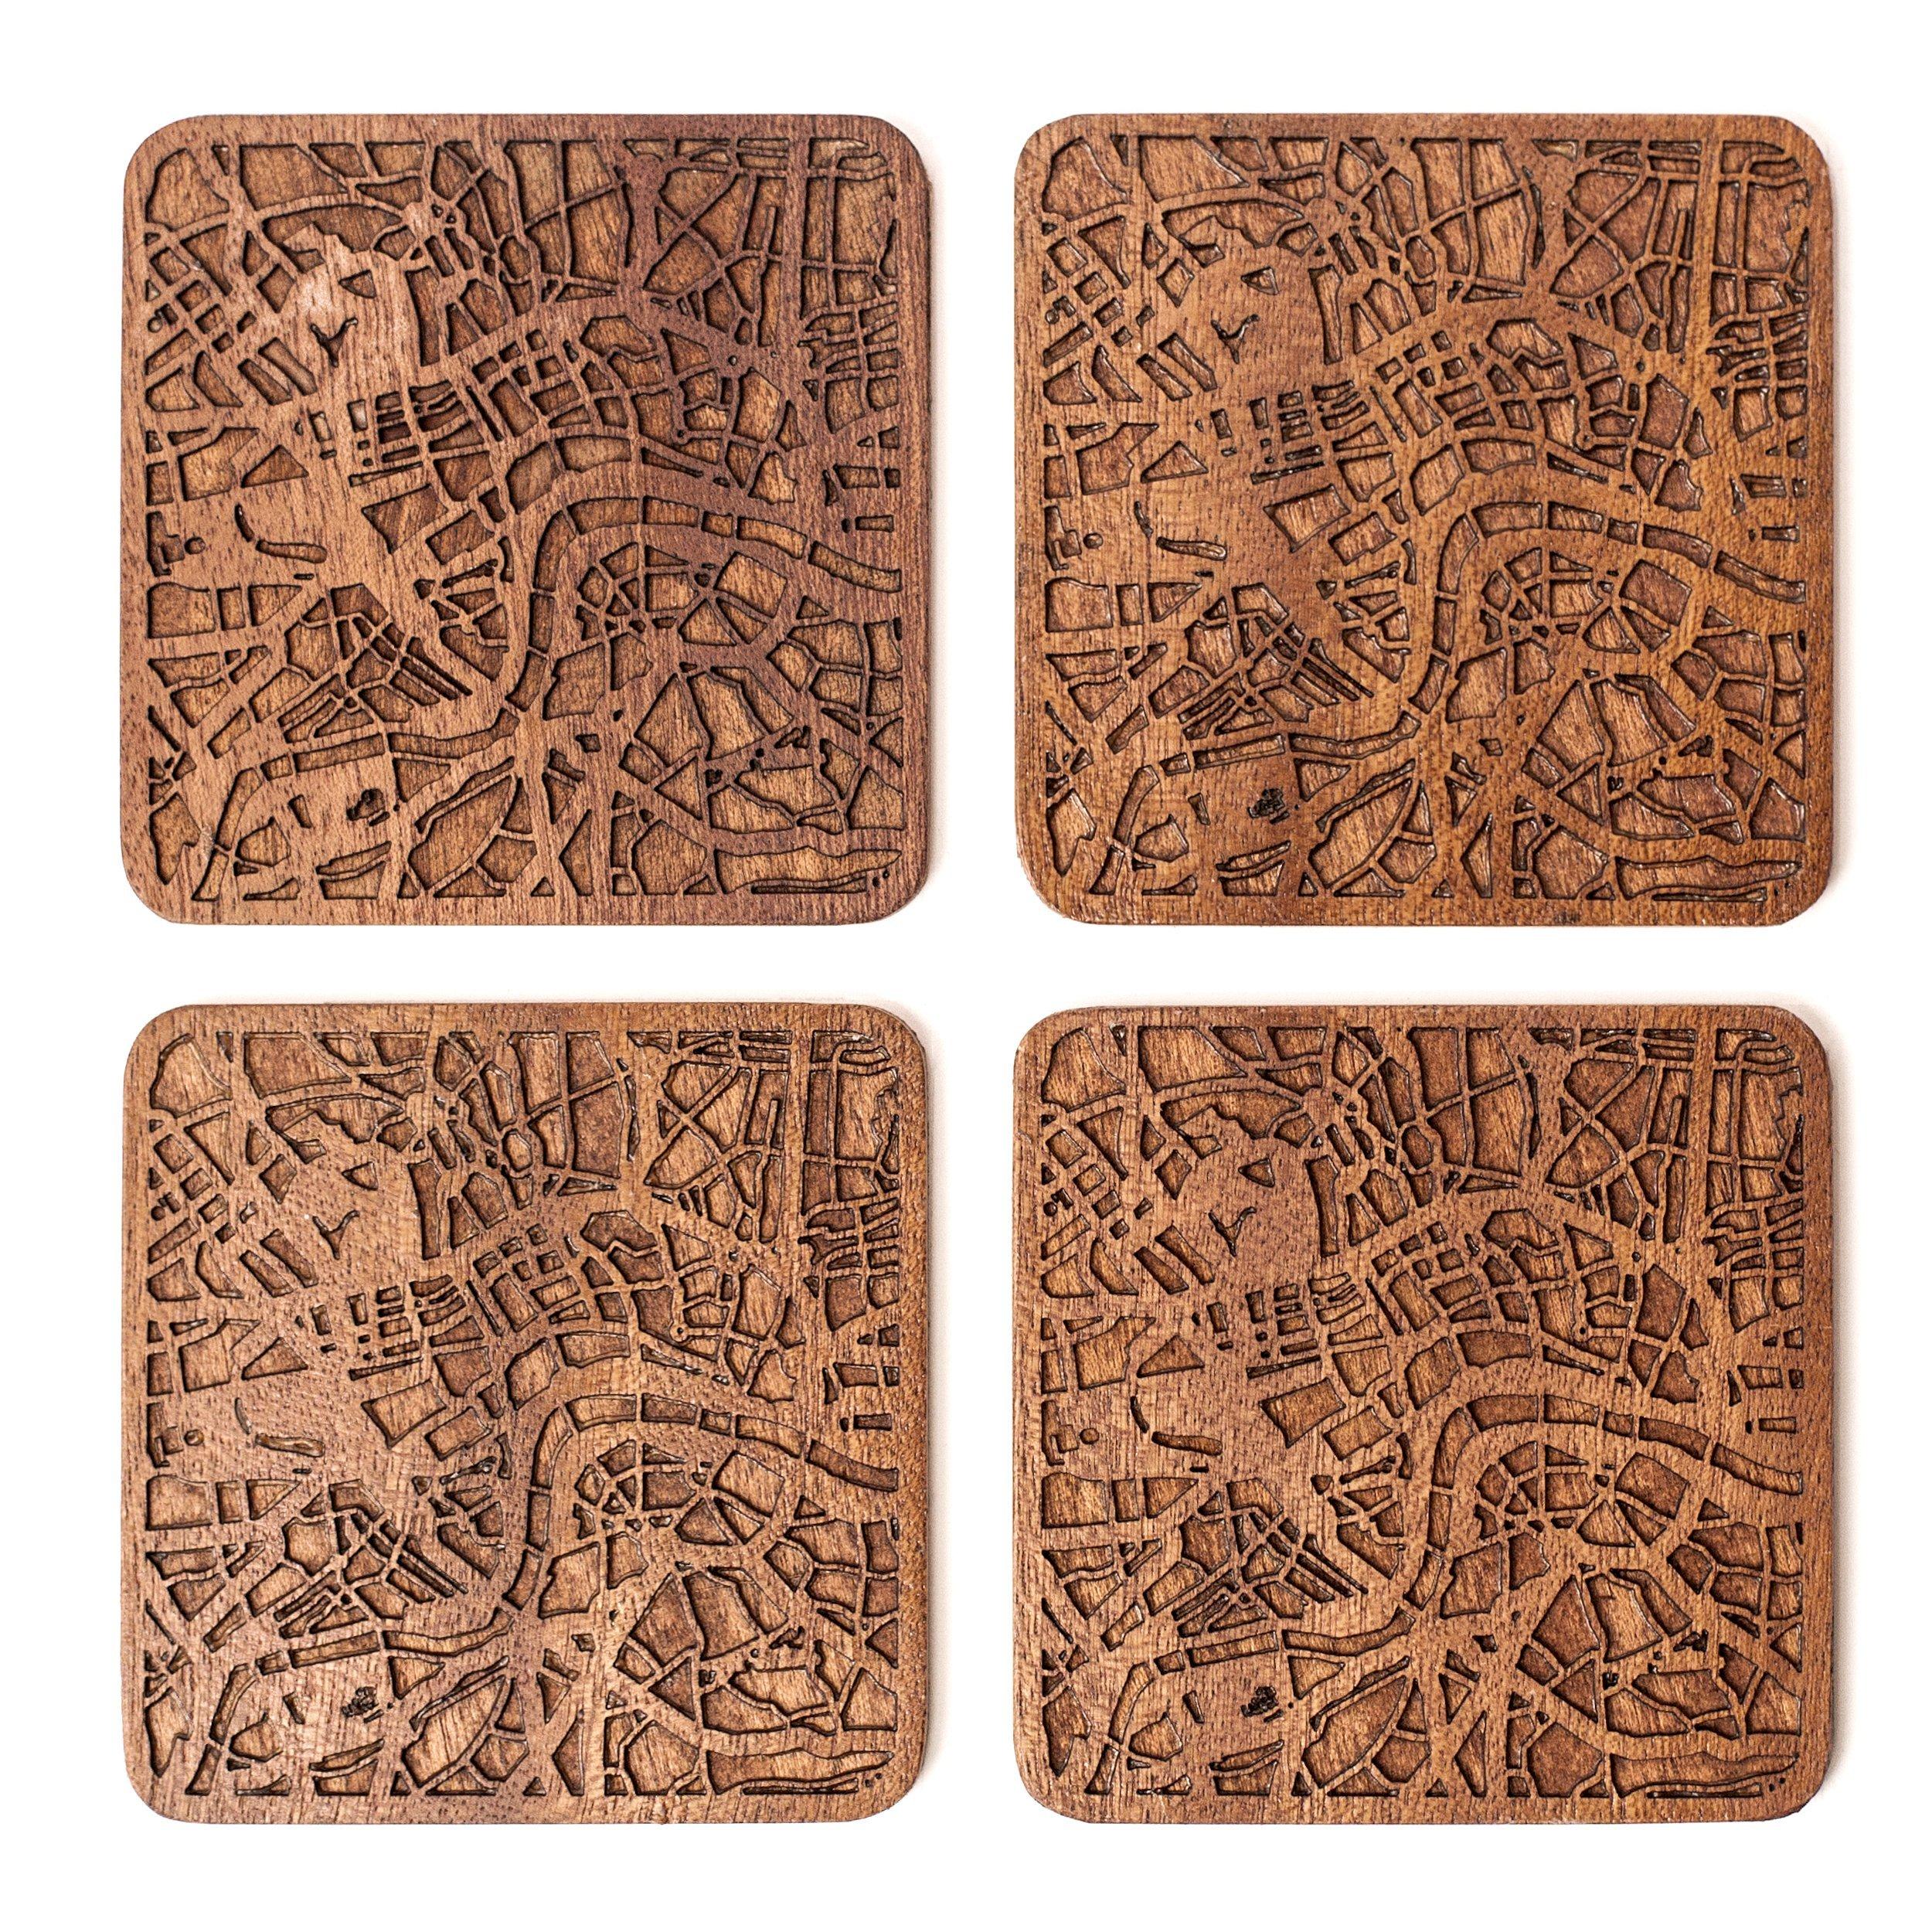 London Map Coaster by O3 Design Studio, Set Of